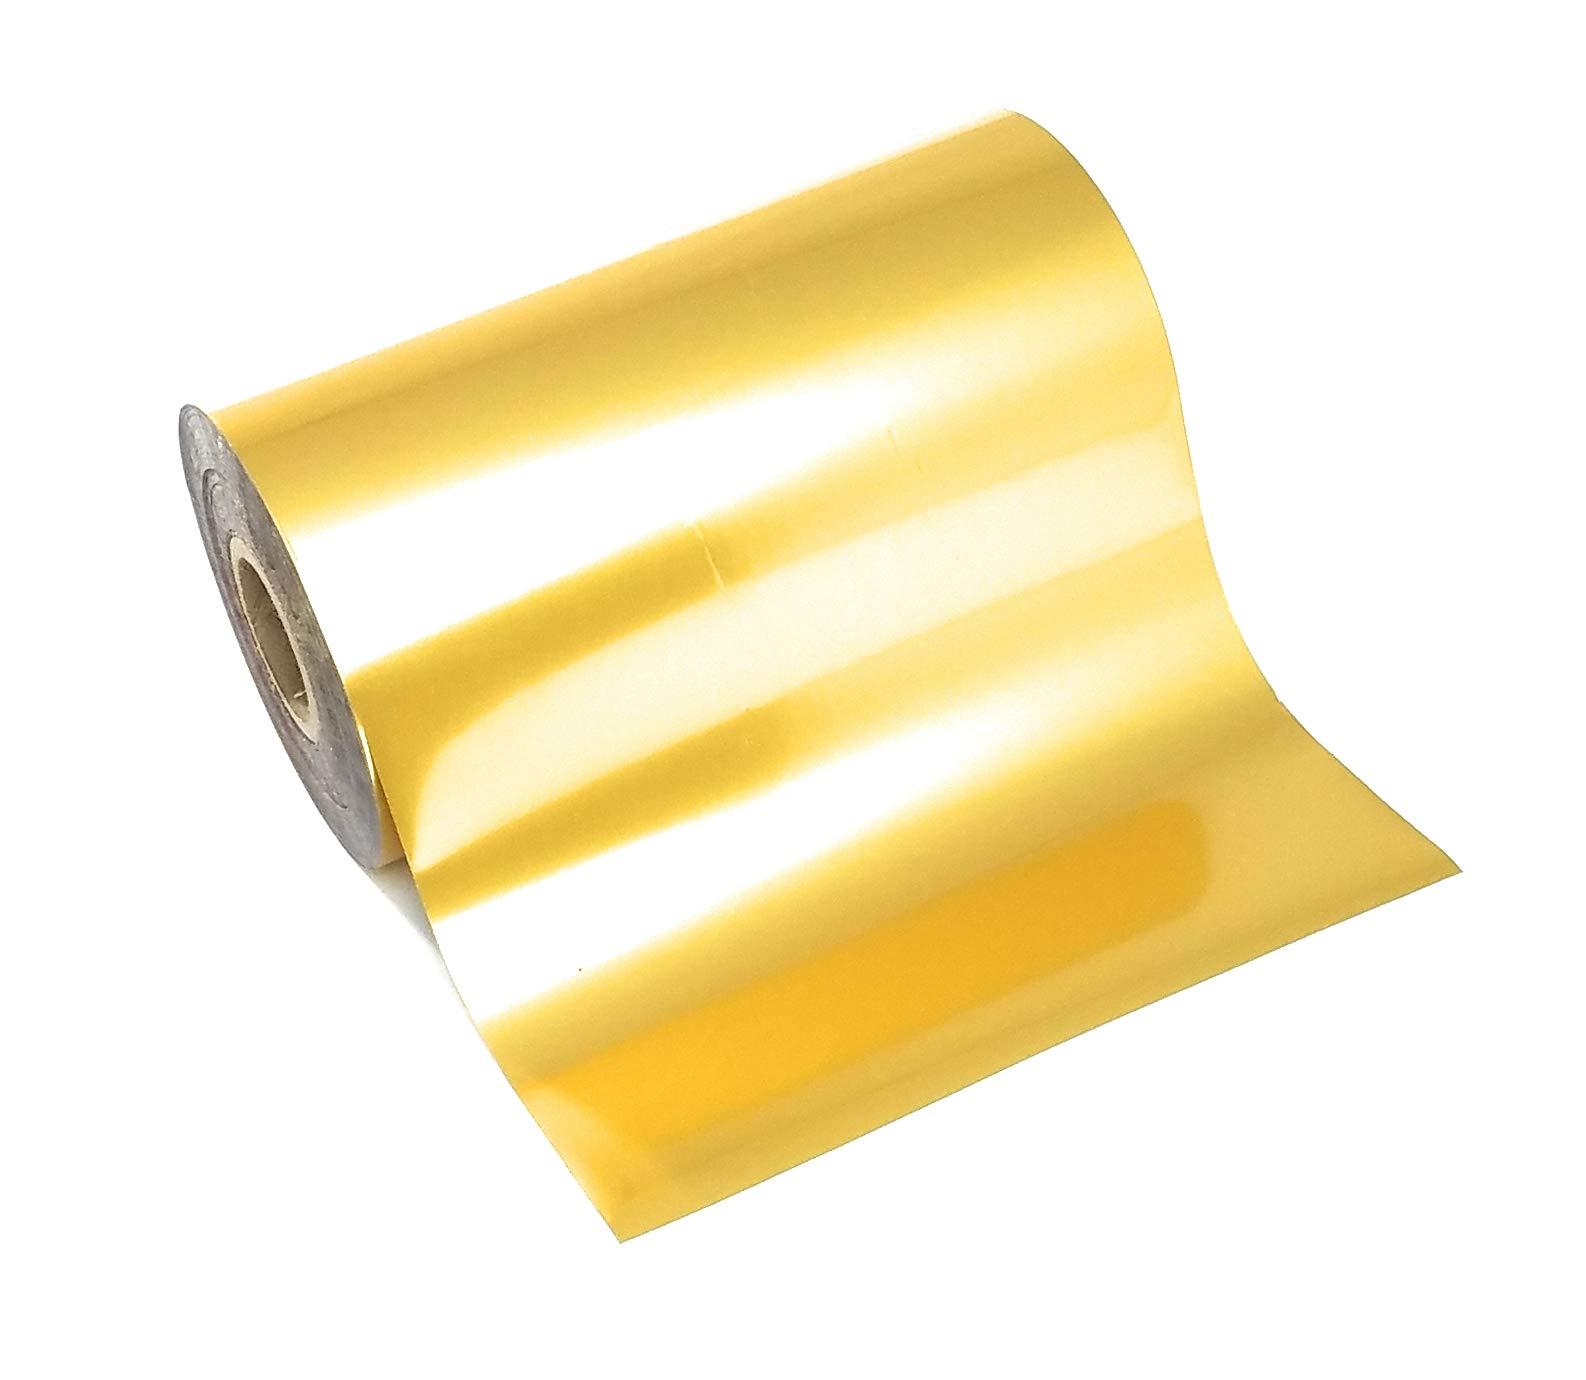 Gold Matte Metallic Hot Stamping Craft Foil by Morfcraft (Image #2)